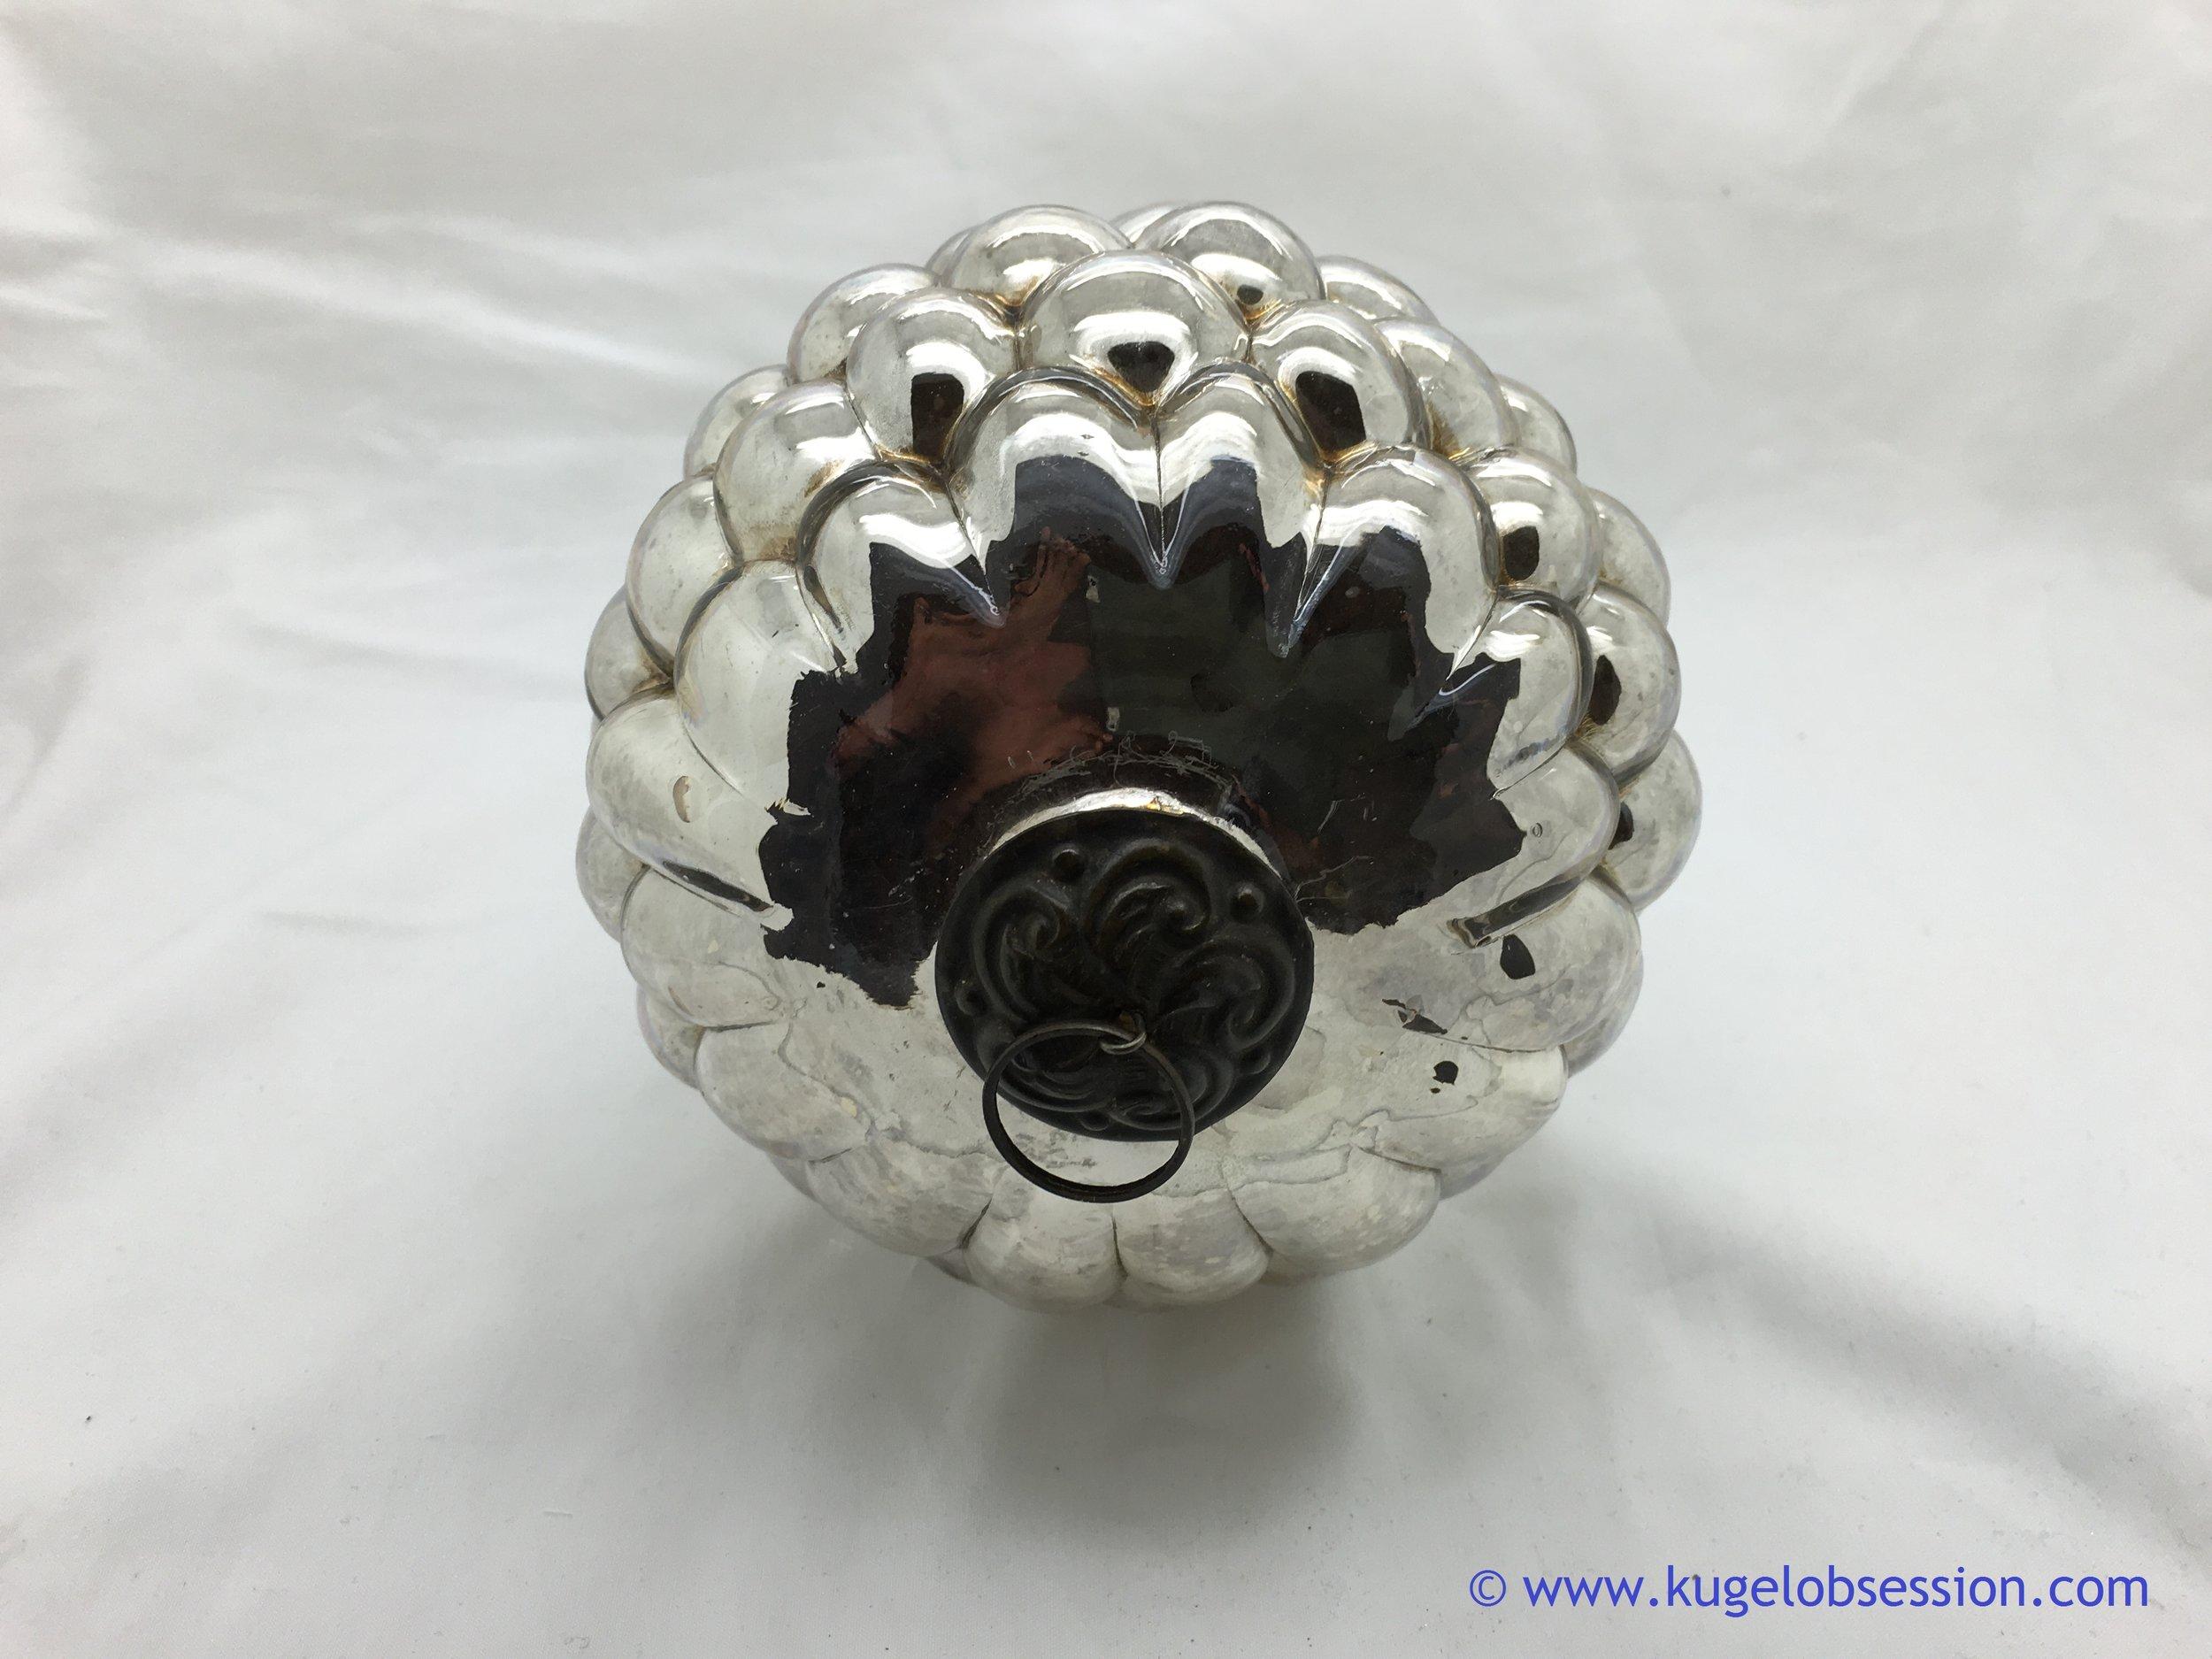 antique-kugel-christmas-ornament-485b